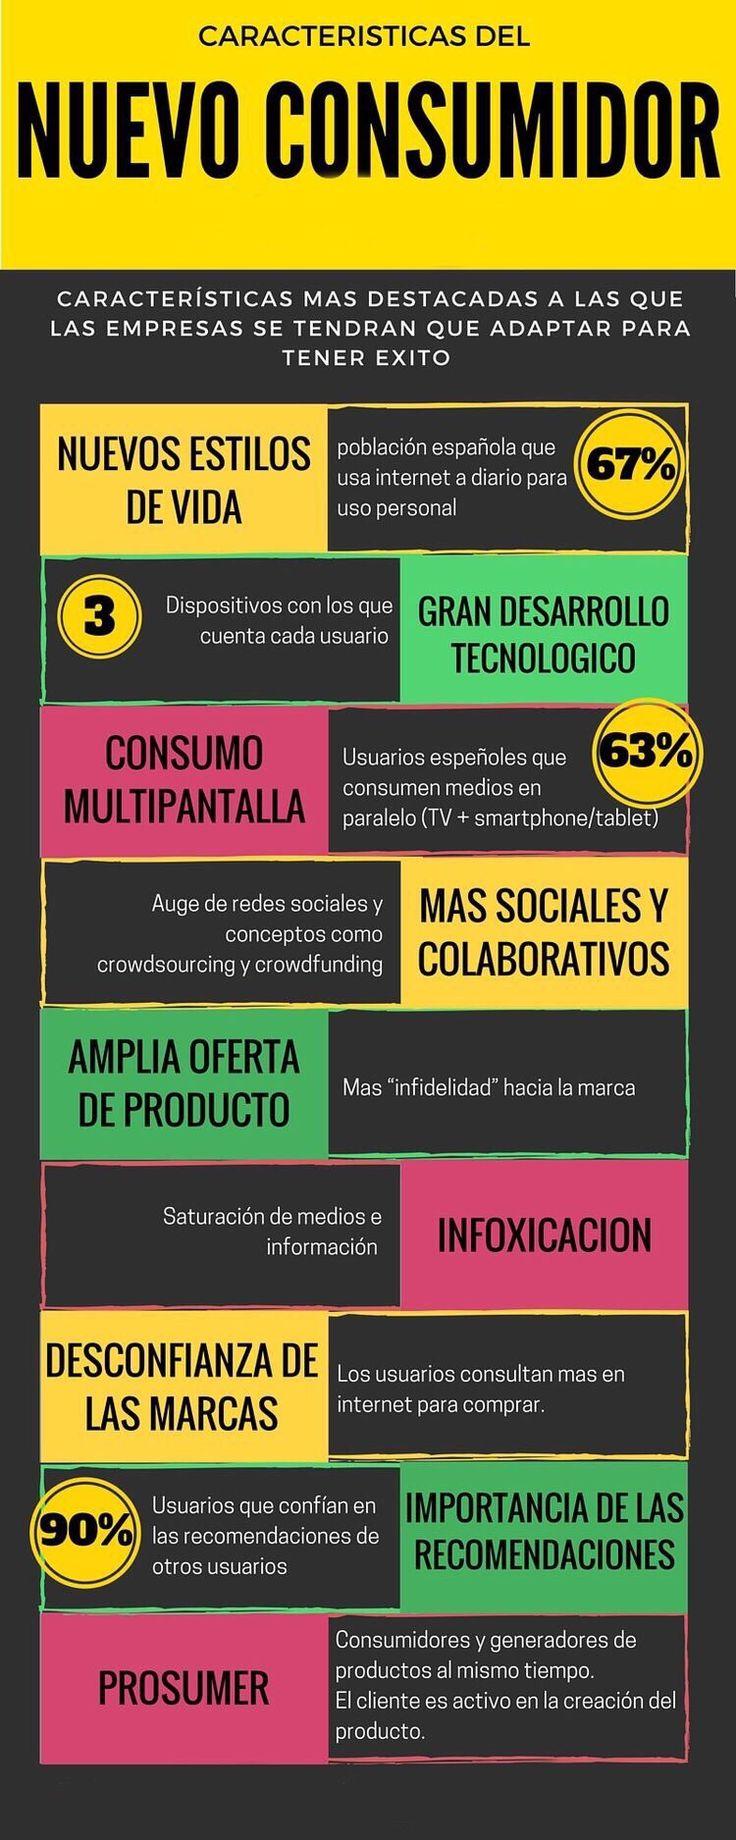 #marketing #marketingpersonal #marketingideas #negocios #follow #follow4follow #marketers